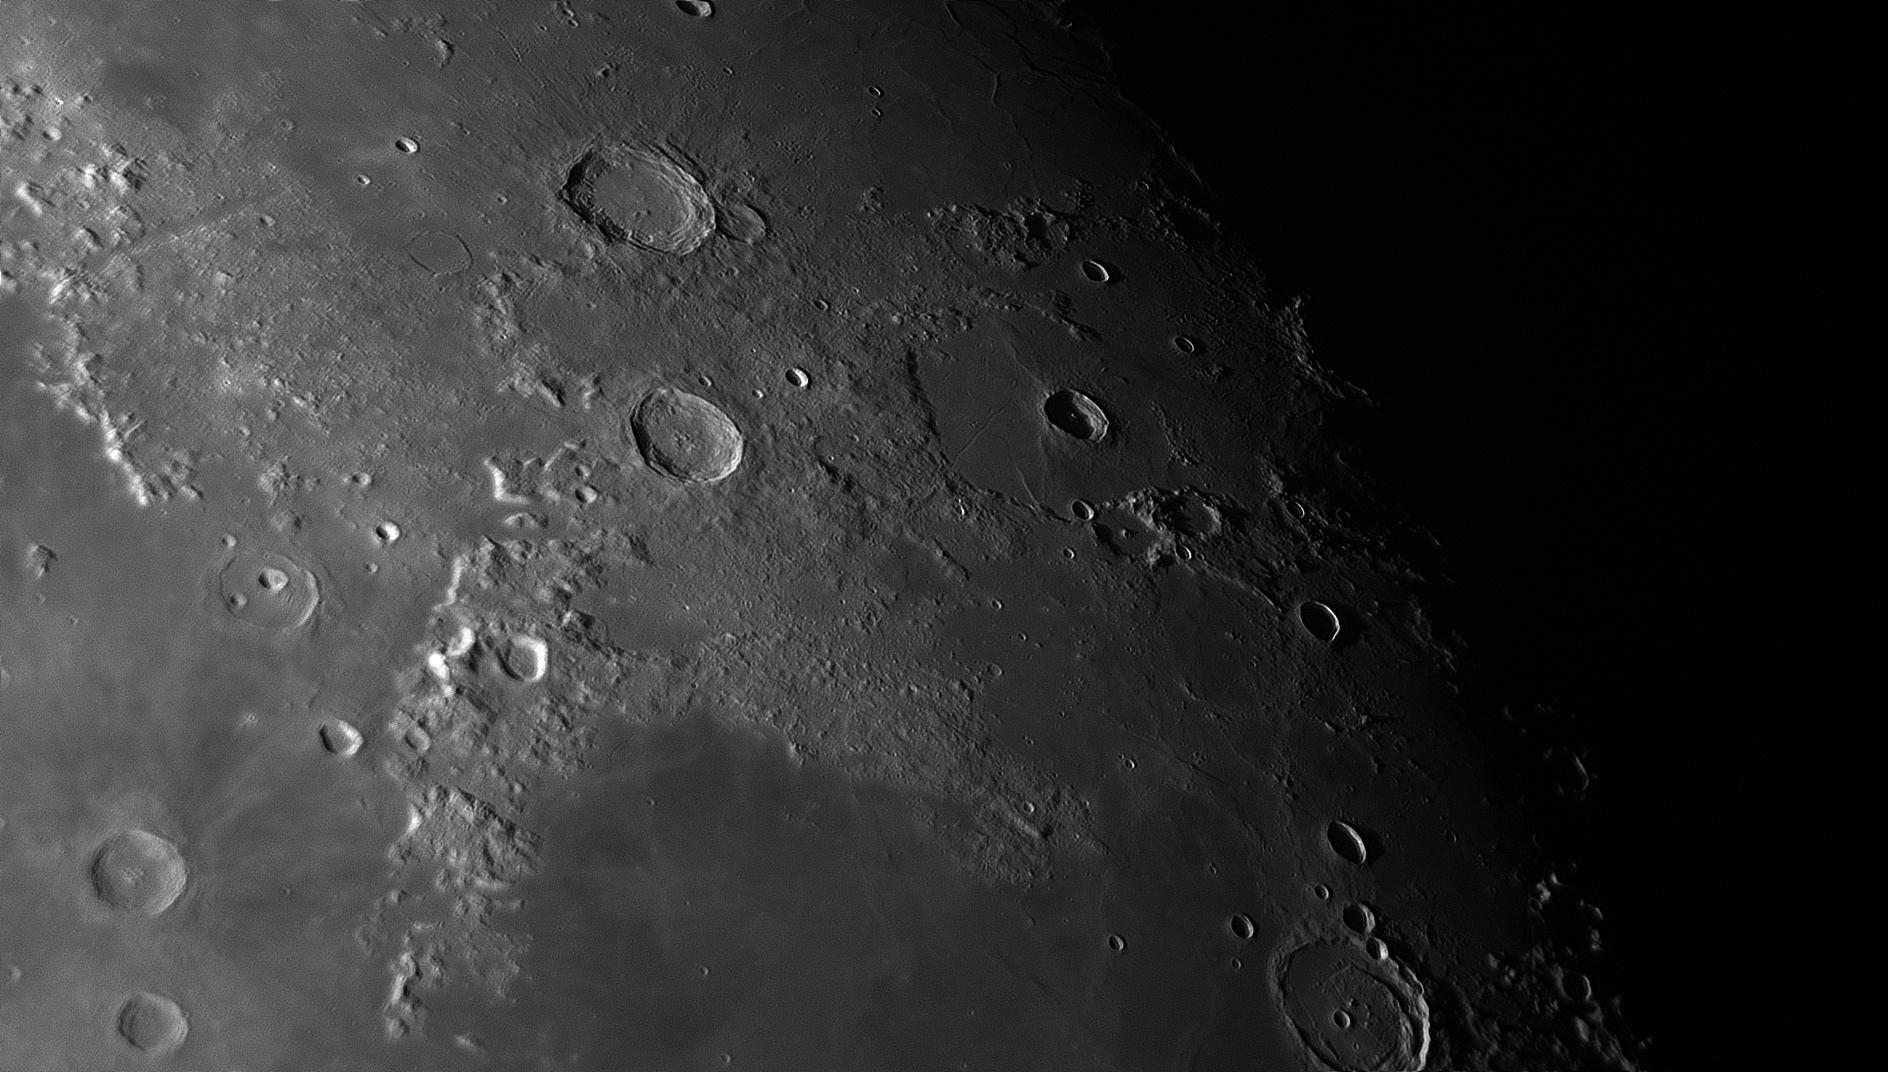 5daa1d4a19577_Moon_054939_181019_ZWOASI290MM_Rouge_23A_AS_P40_lapl4_ap340ast.jpg.08010cd92487efb925f5e76edffcb6c3.jpg